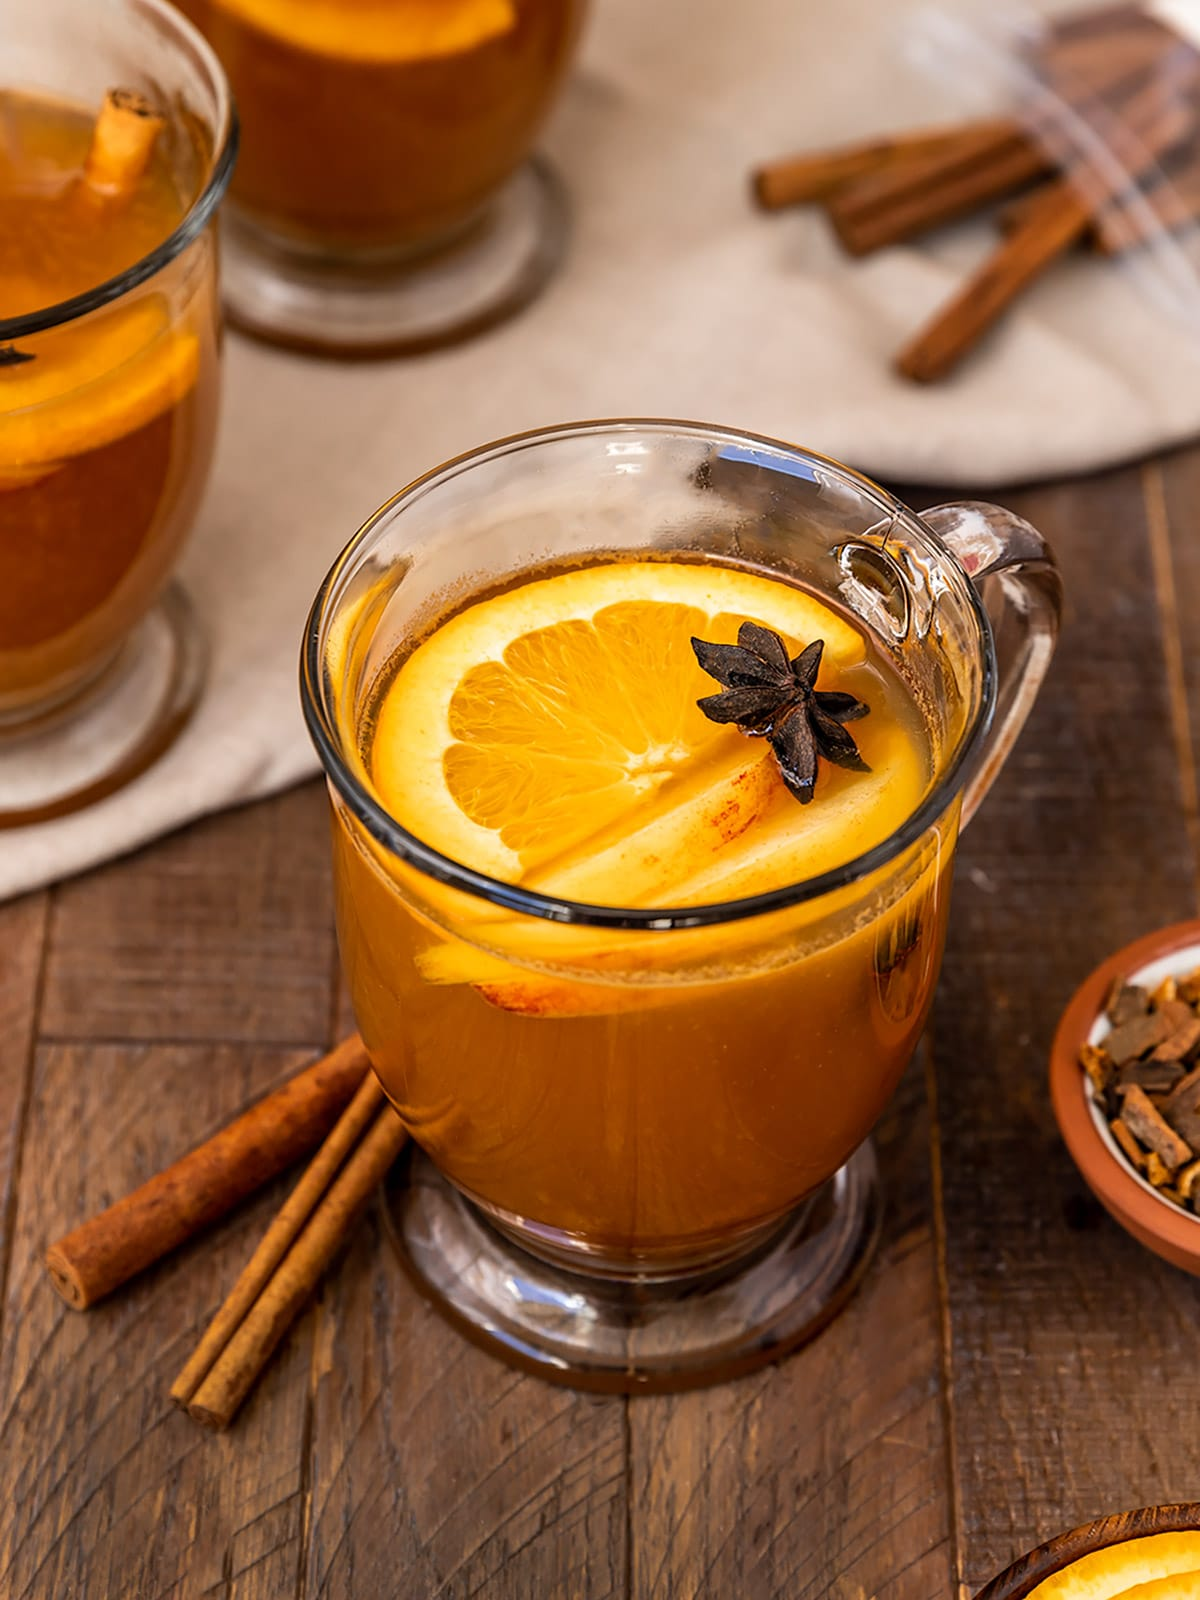 a mug of bourbon apple cider garnished with orange slices, apple slices, and star anise